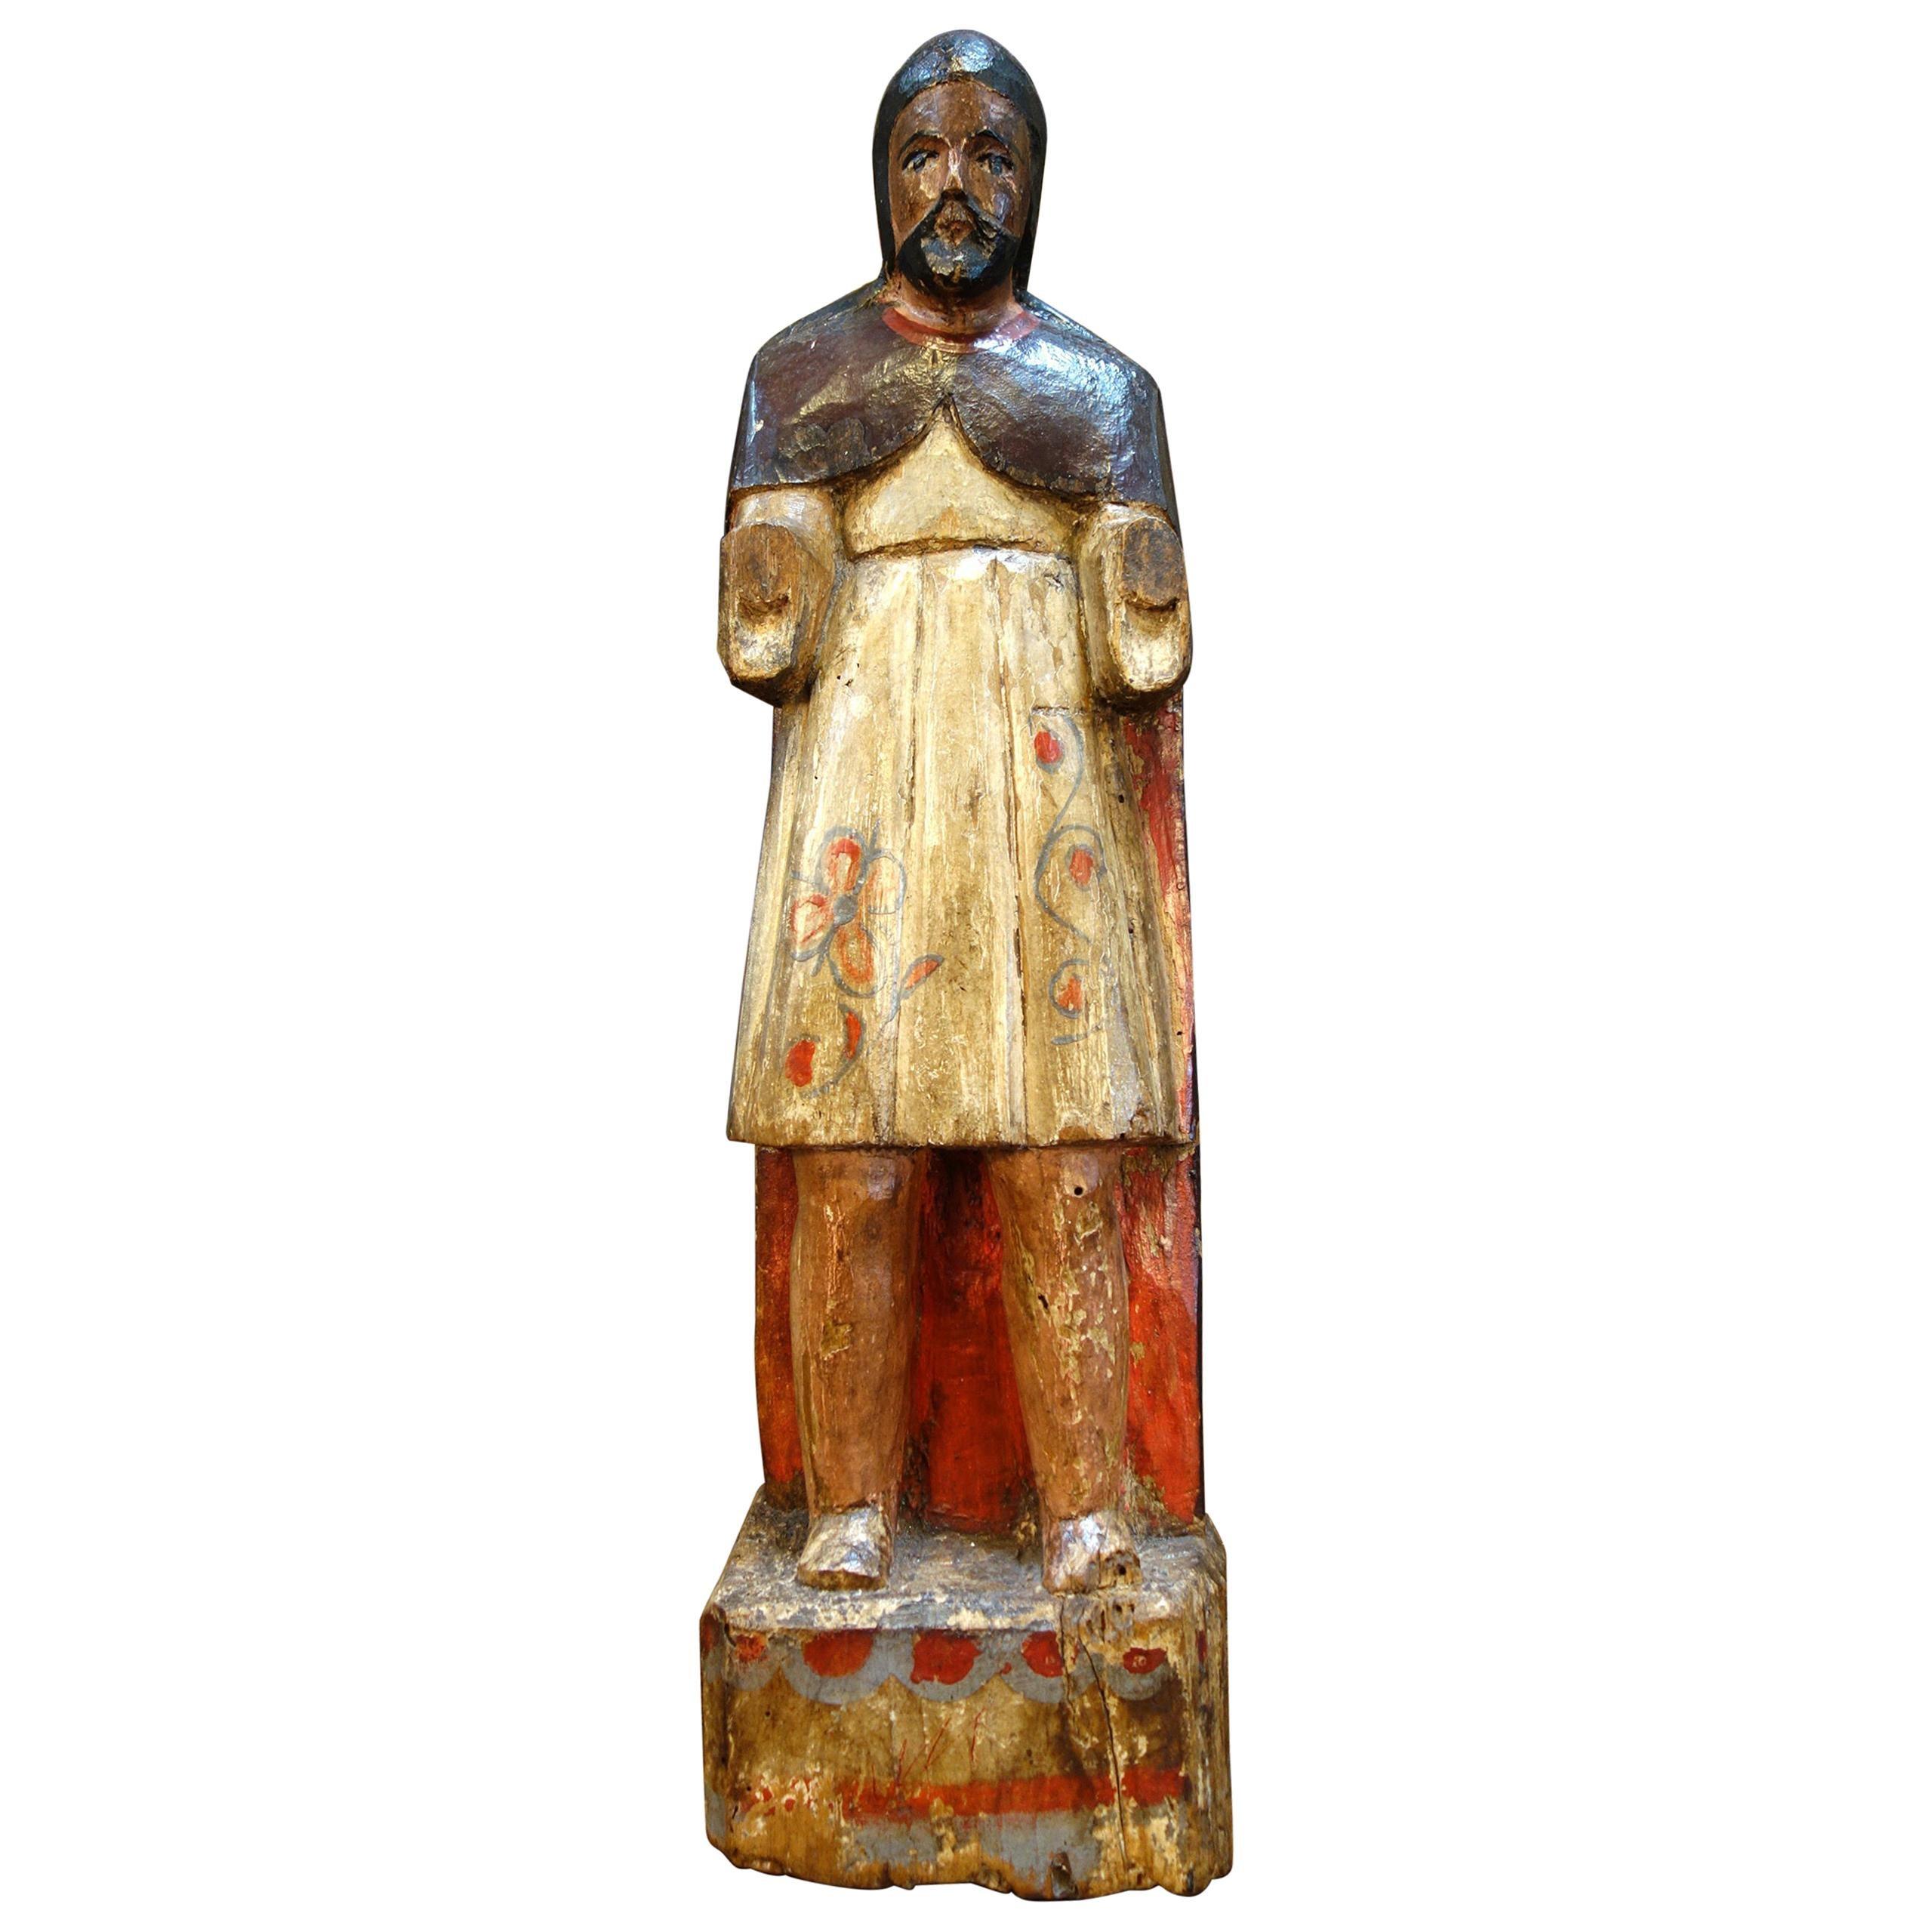 19th Century Italian Carved & Painted Primitive Male Santos Wood Sculpture